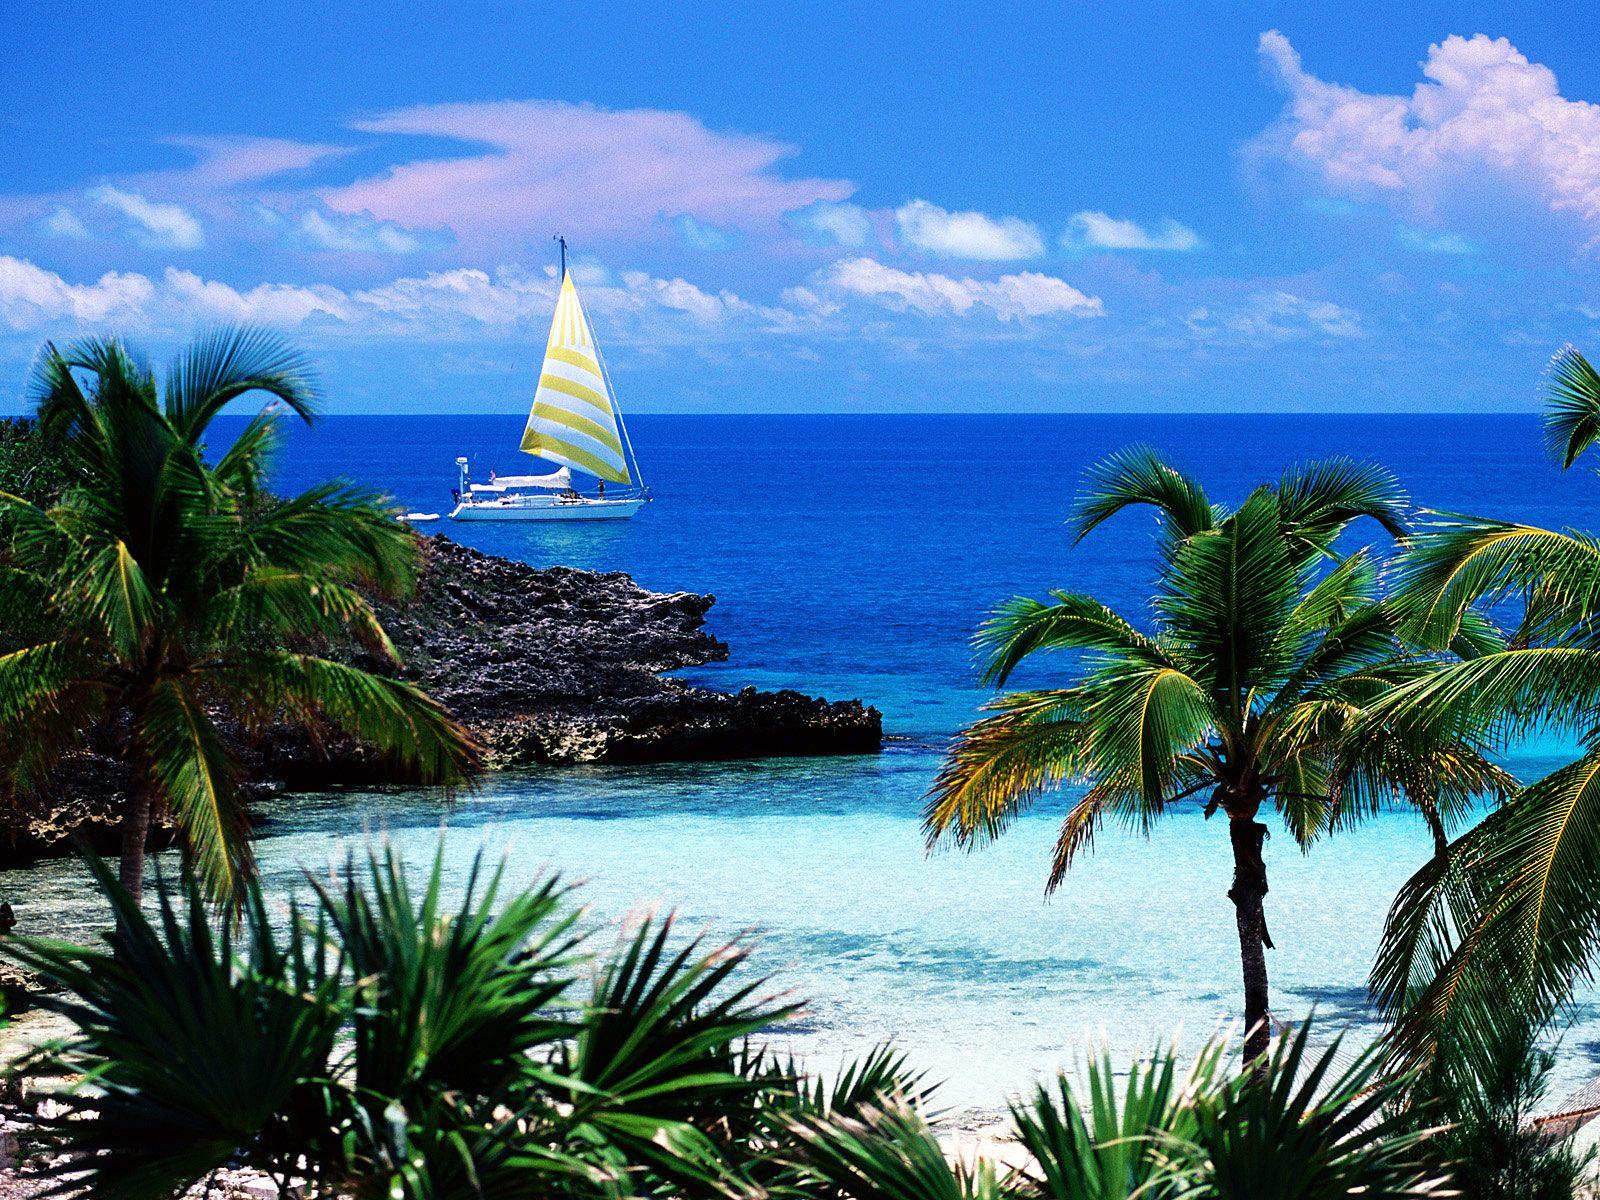 http://1.bp.blogspot.com/-sHw27iDm3t0/TbGq9ONMrMI/AAAAAAAAAKk/ISYfoRXfsD8/s1600/eleuthera_point__harbour_island__bahamas.jpg